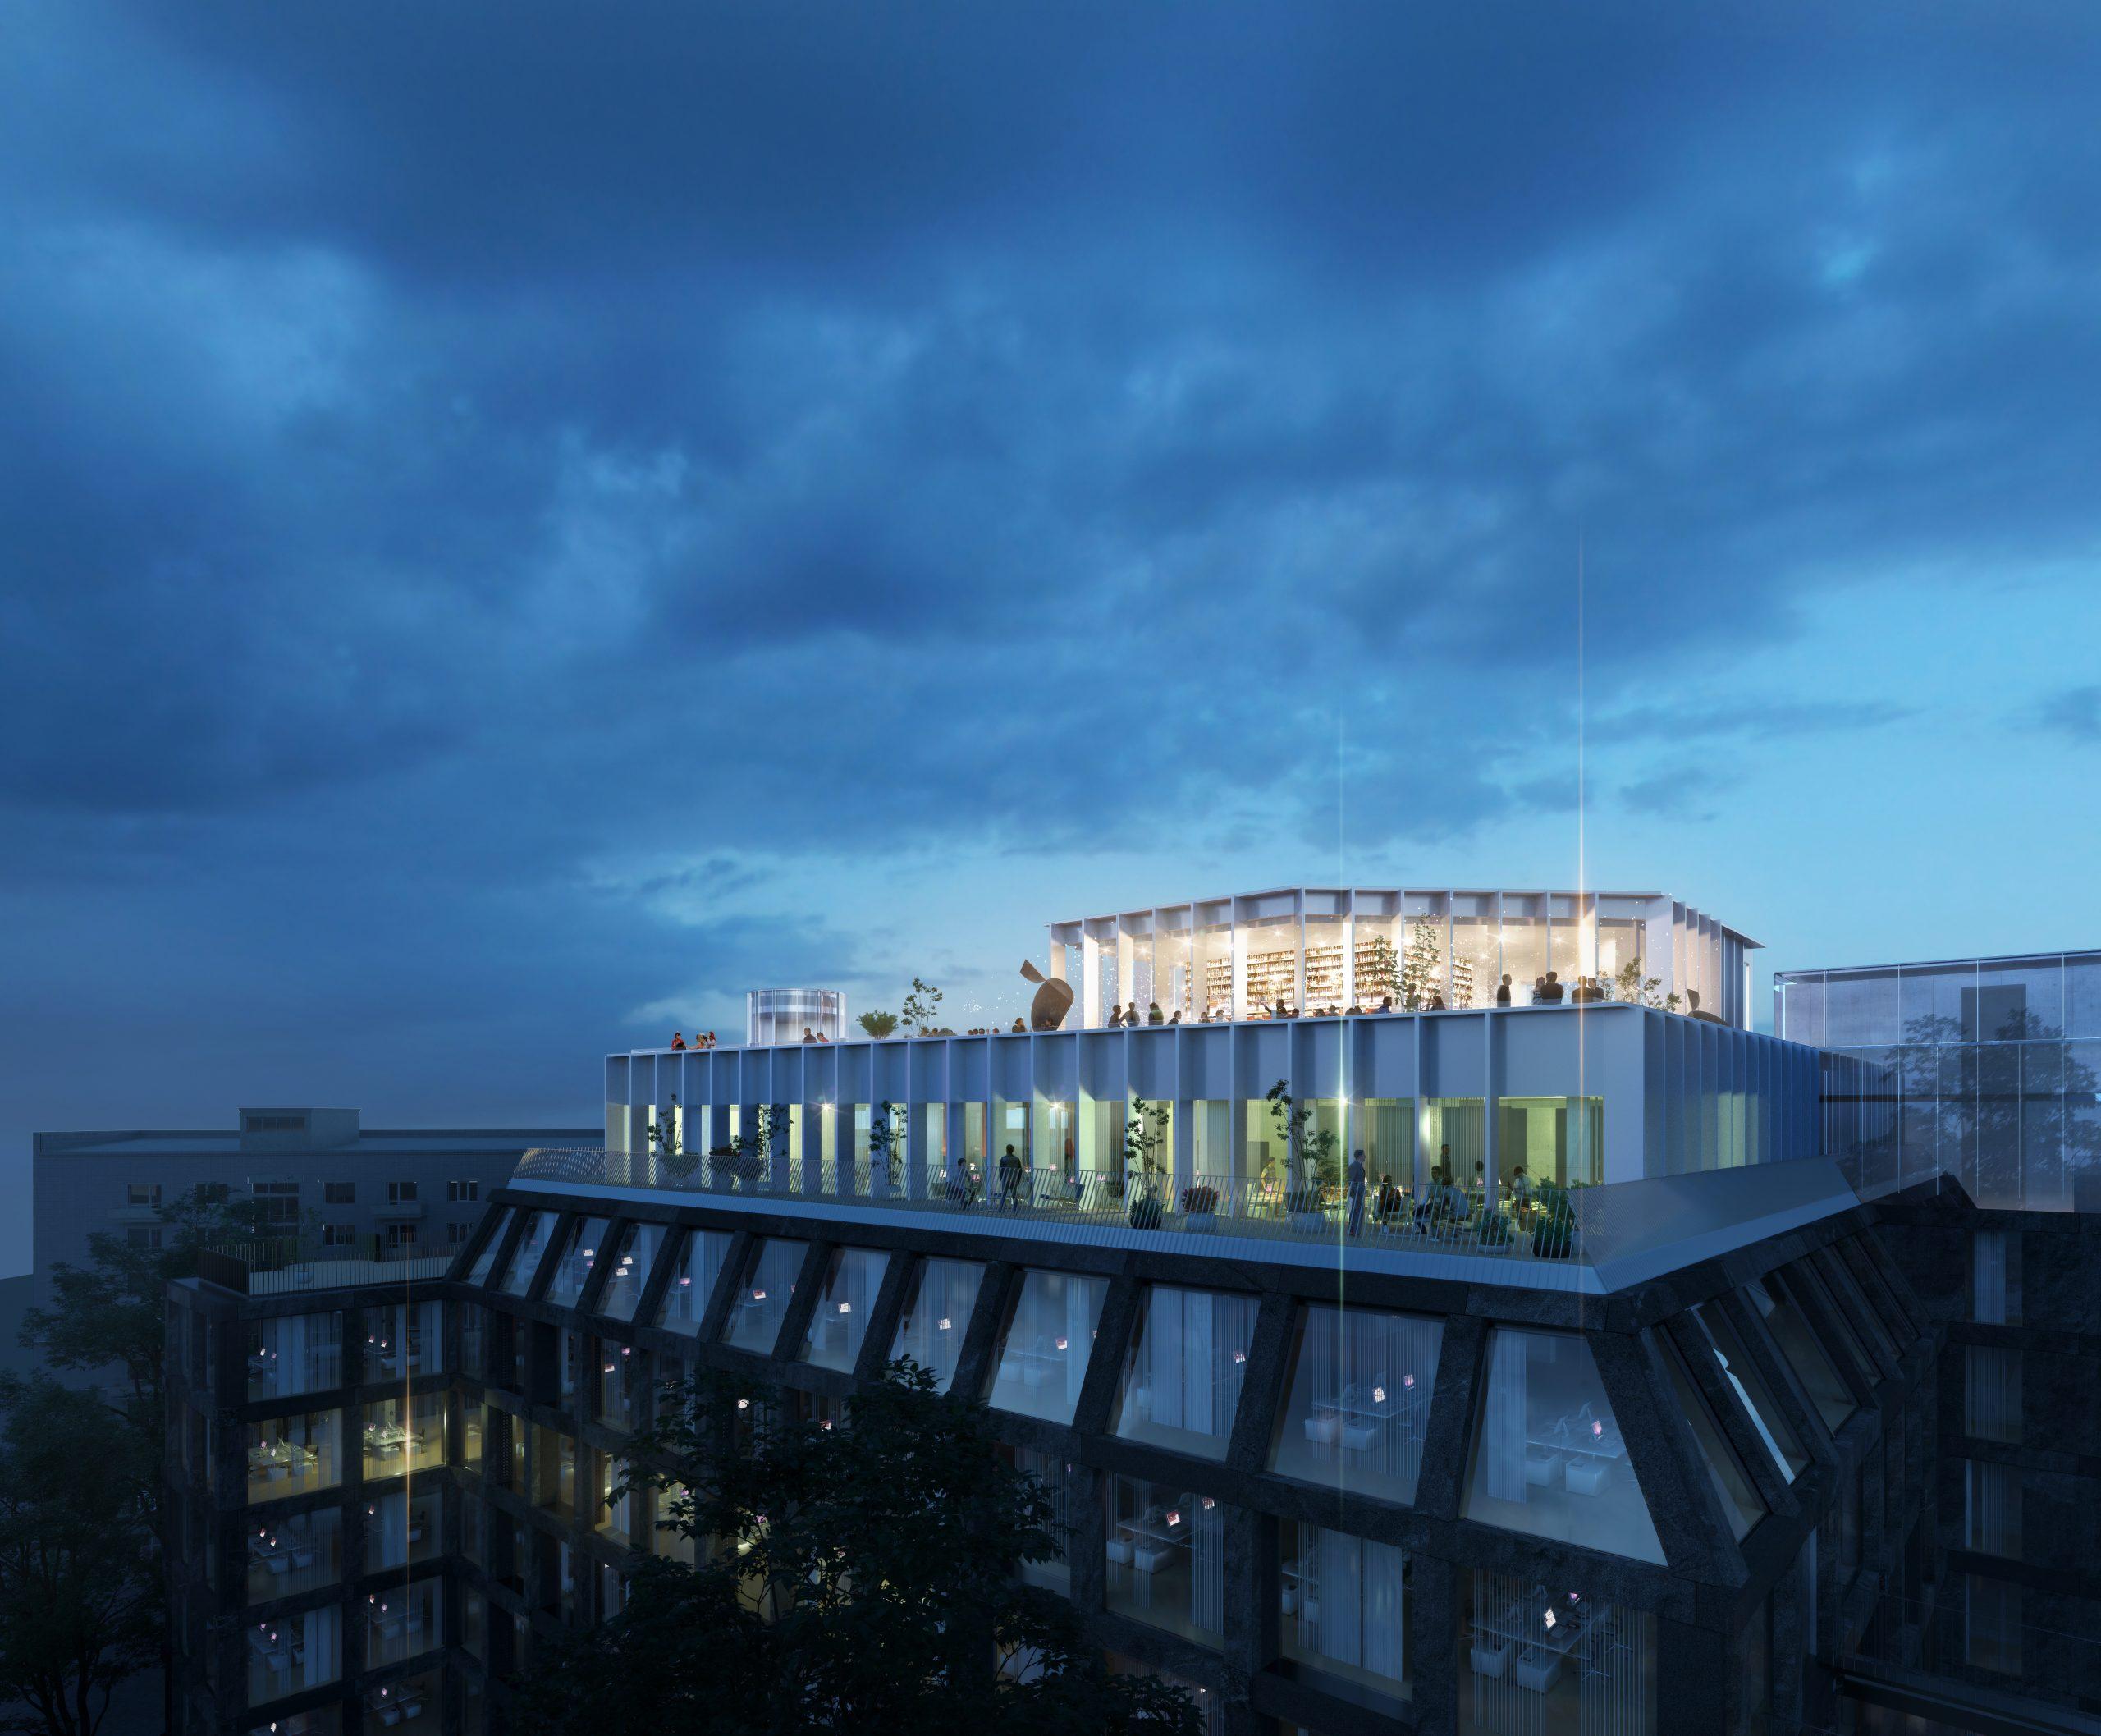 ANDRIYIVSKA VIEW 2 night roof